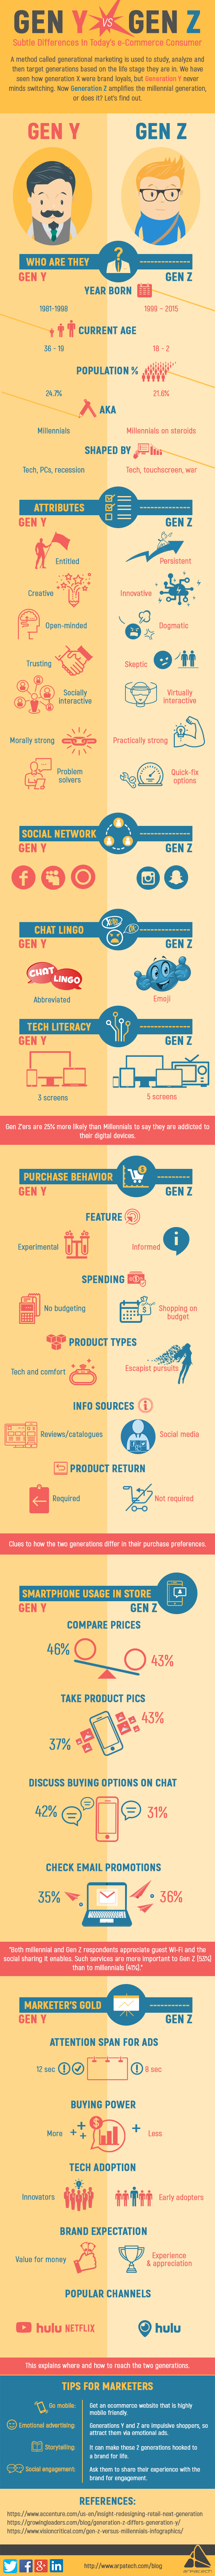 Digital Aspirants Vs Digital Natives: What Sets Generation-Y and Gen-Z Apart - Infographic